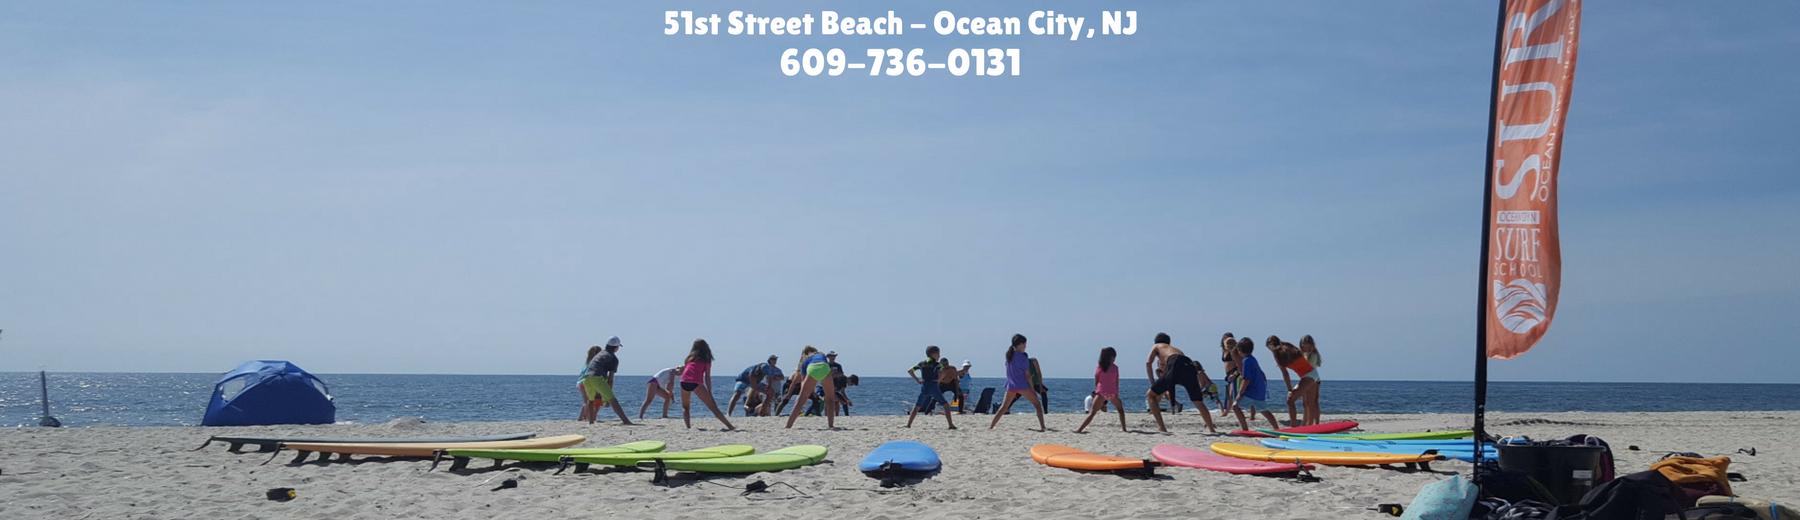 OCNJ Surf School